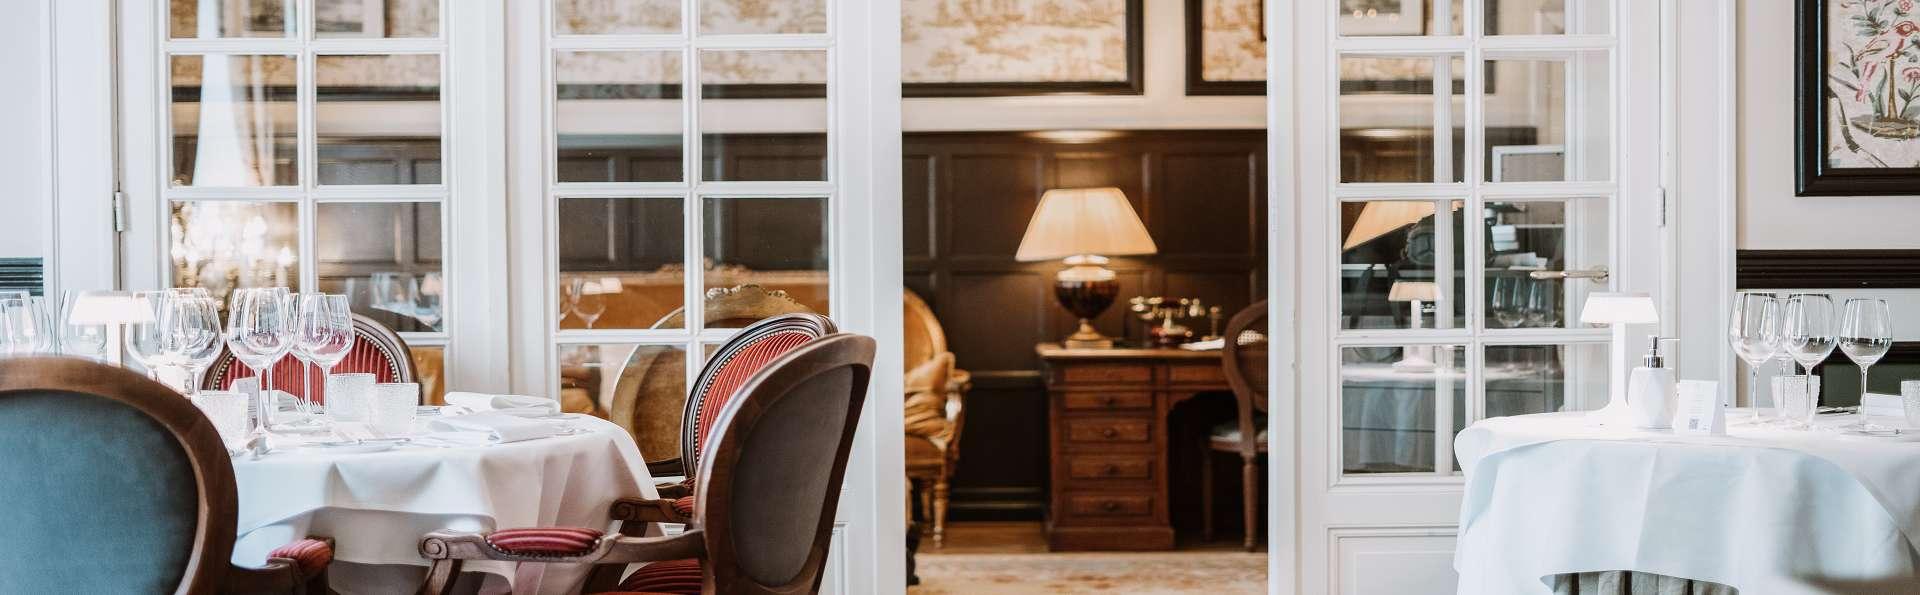 Relais & Châteaux Hotel Heritage - 16_Restaurant_Lotte_van_Uittert_.jpg